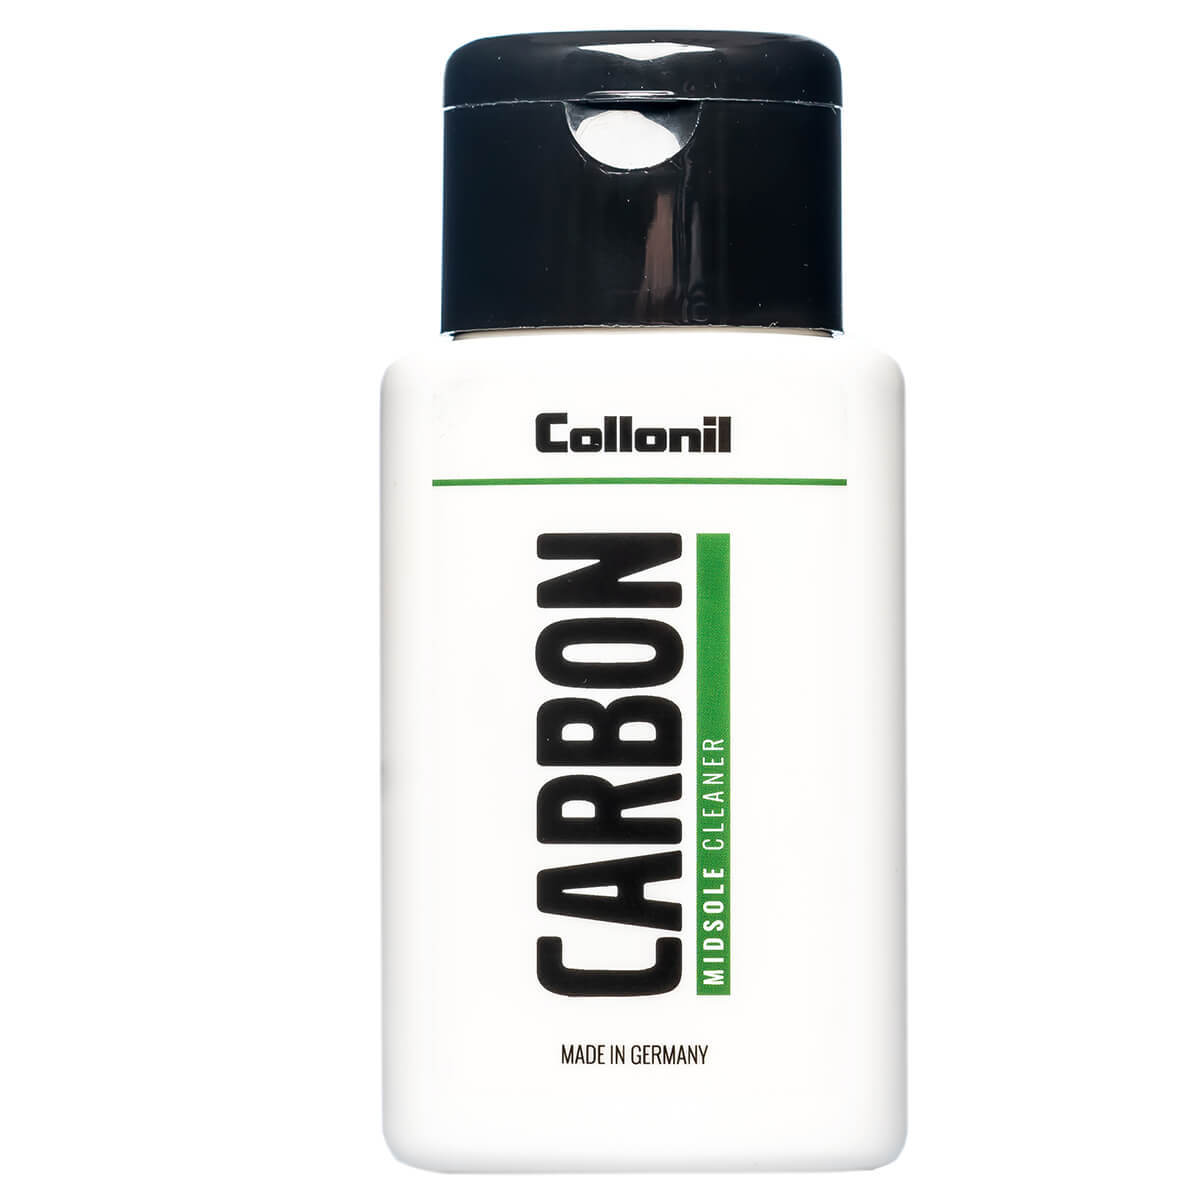 COLLONIL Collonil Carbon - Midsole Cleaner